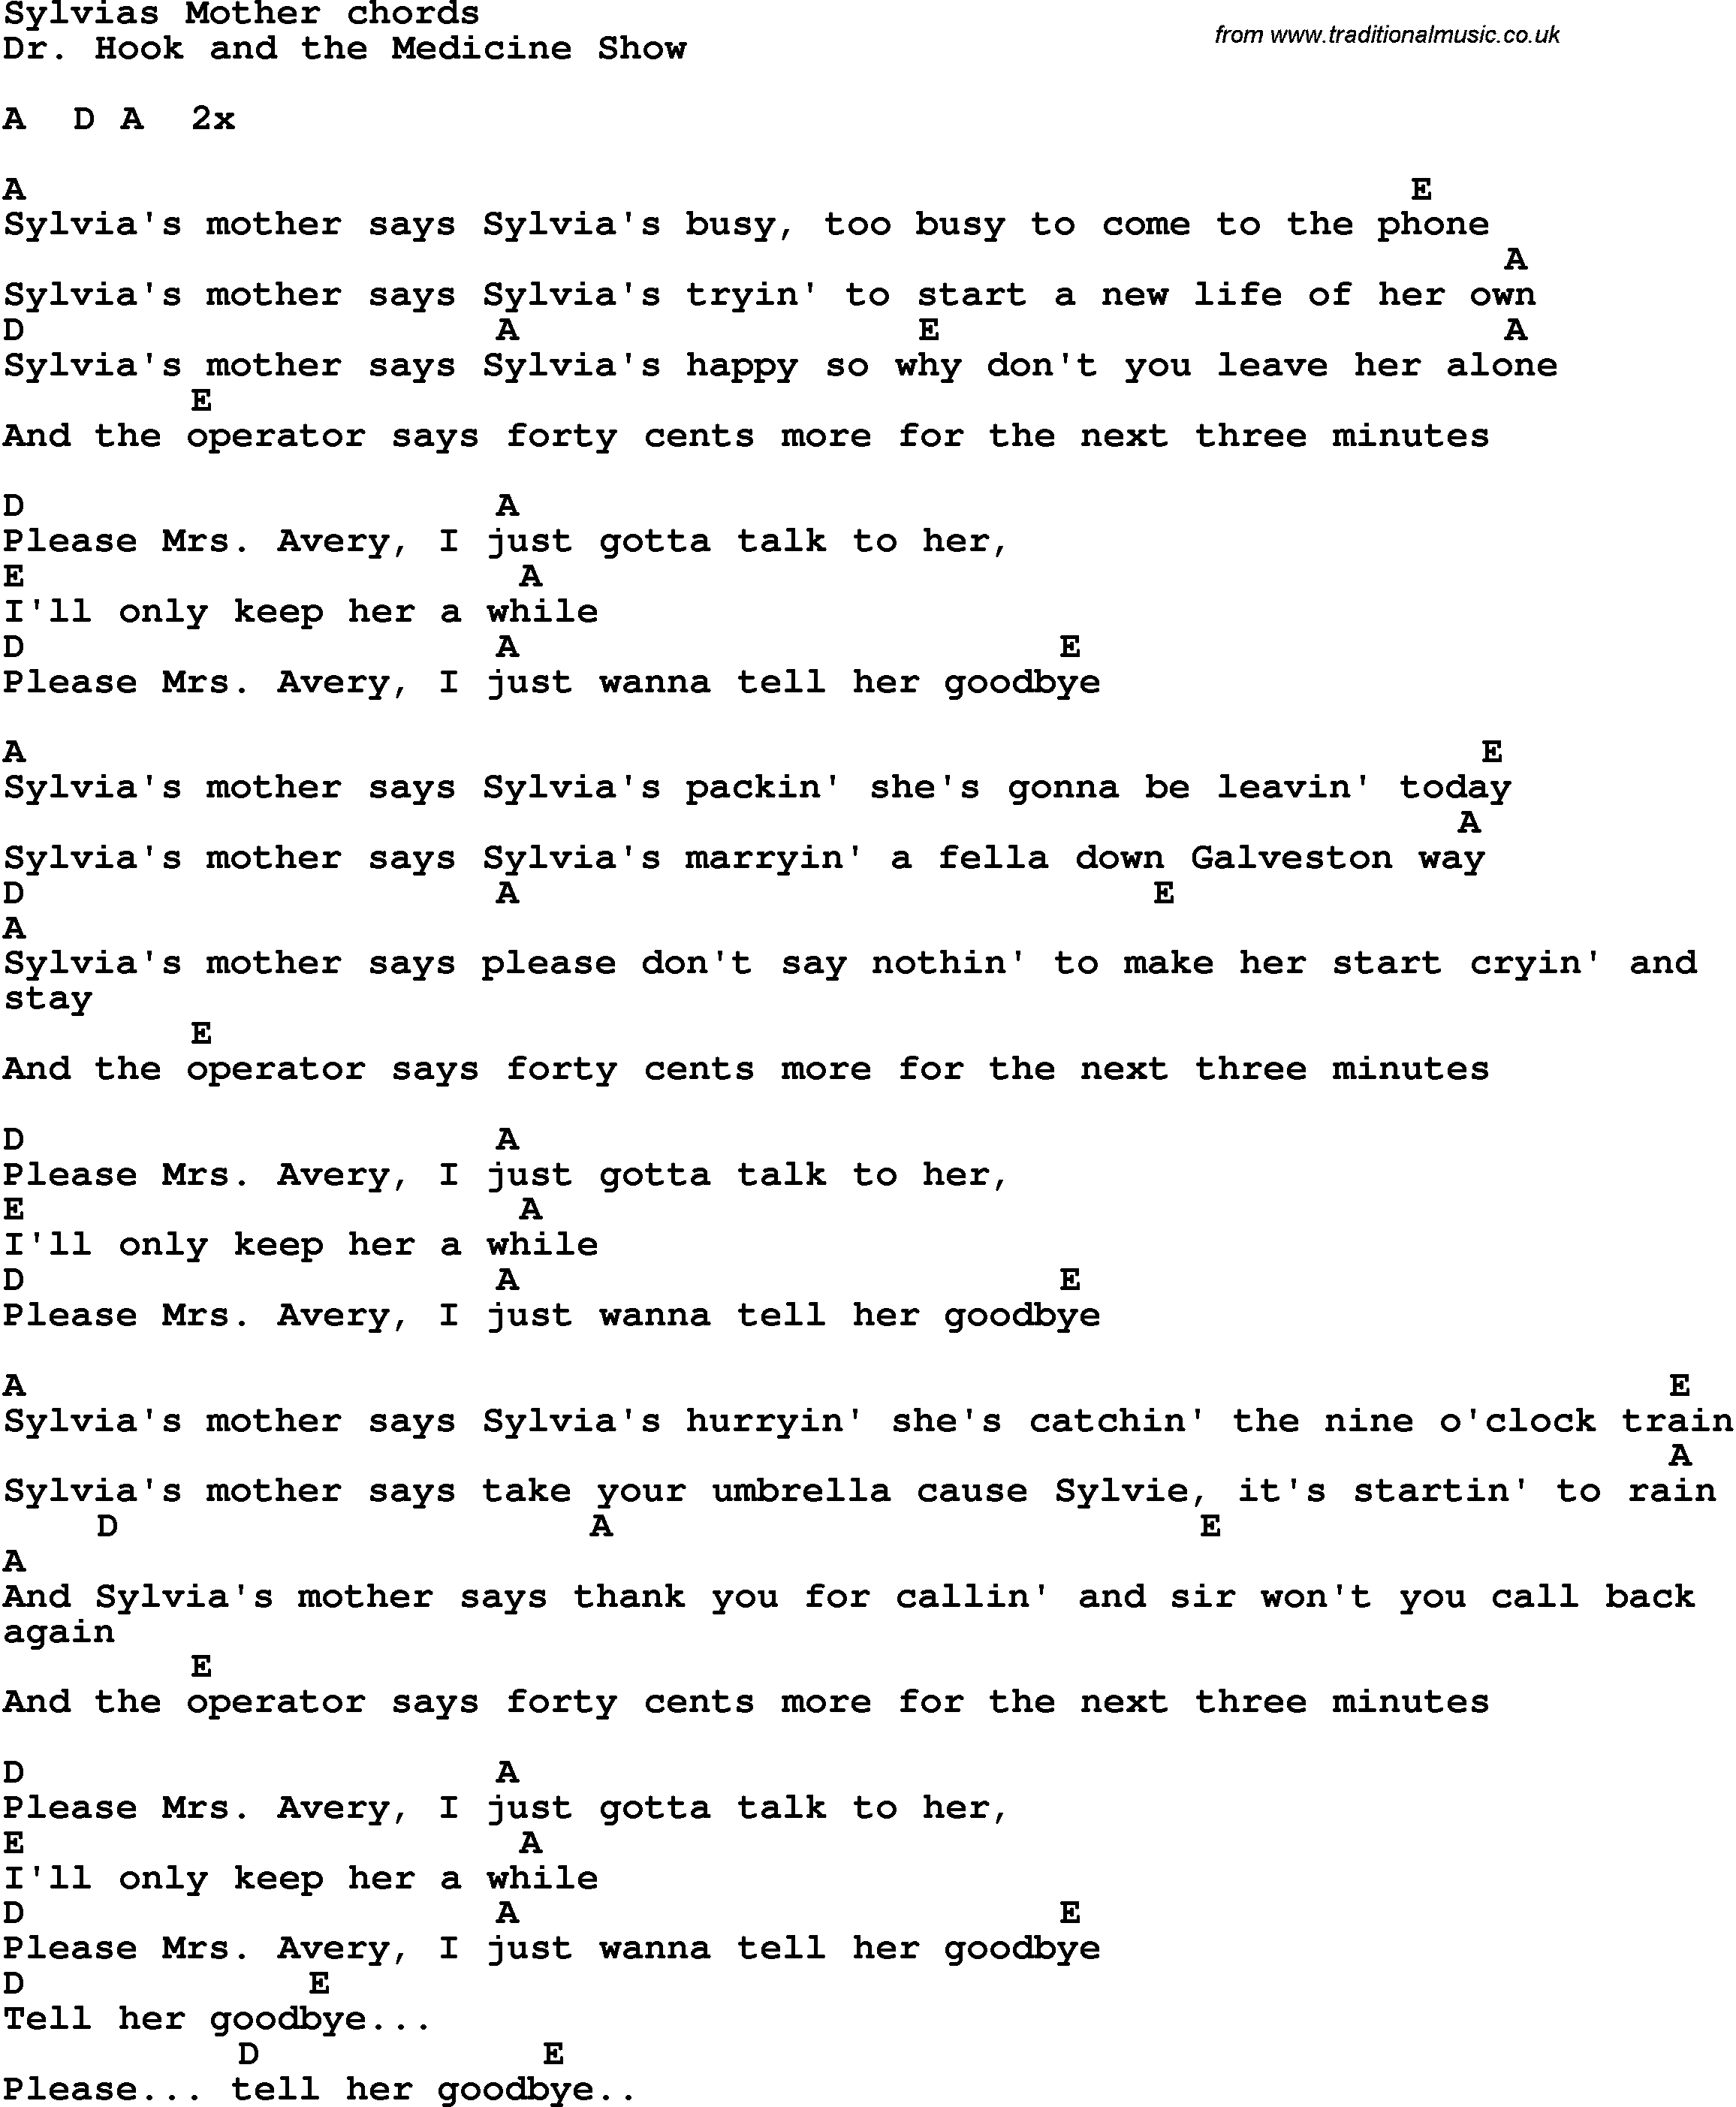 Lyrics to sylvias mother song lyrics with guitar chords for lyrics to sylvias mother song lyrics with guitar chords for sylvias mother hexwebz Choice Image